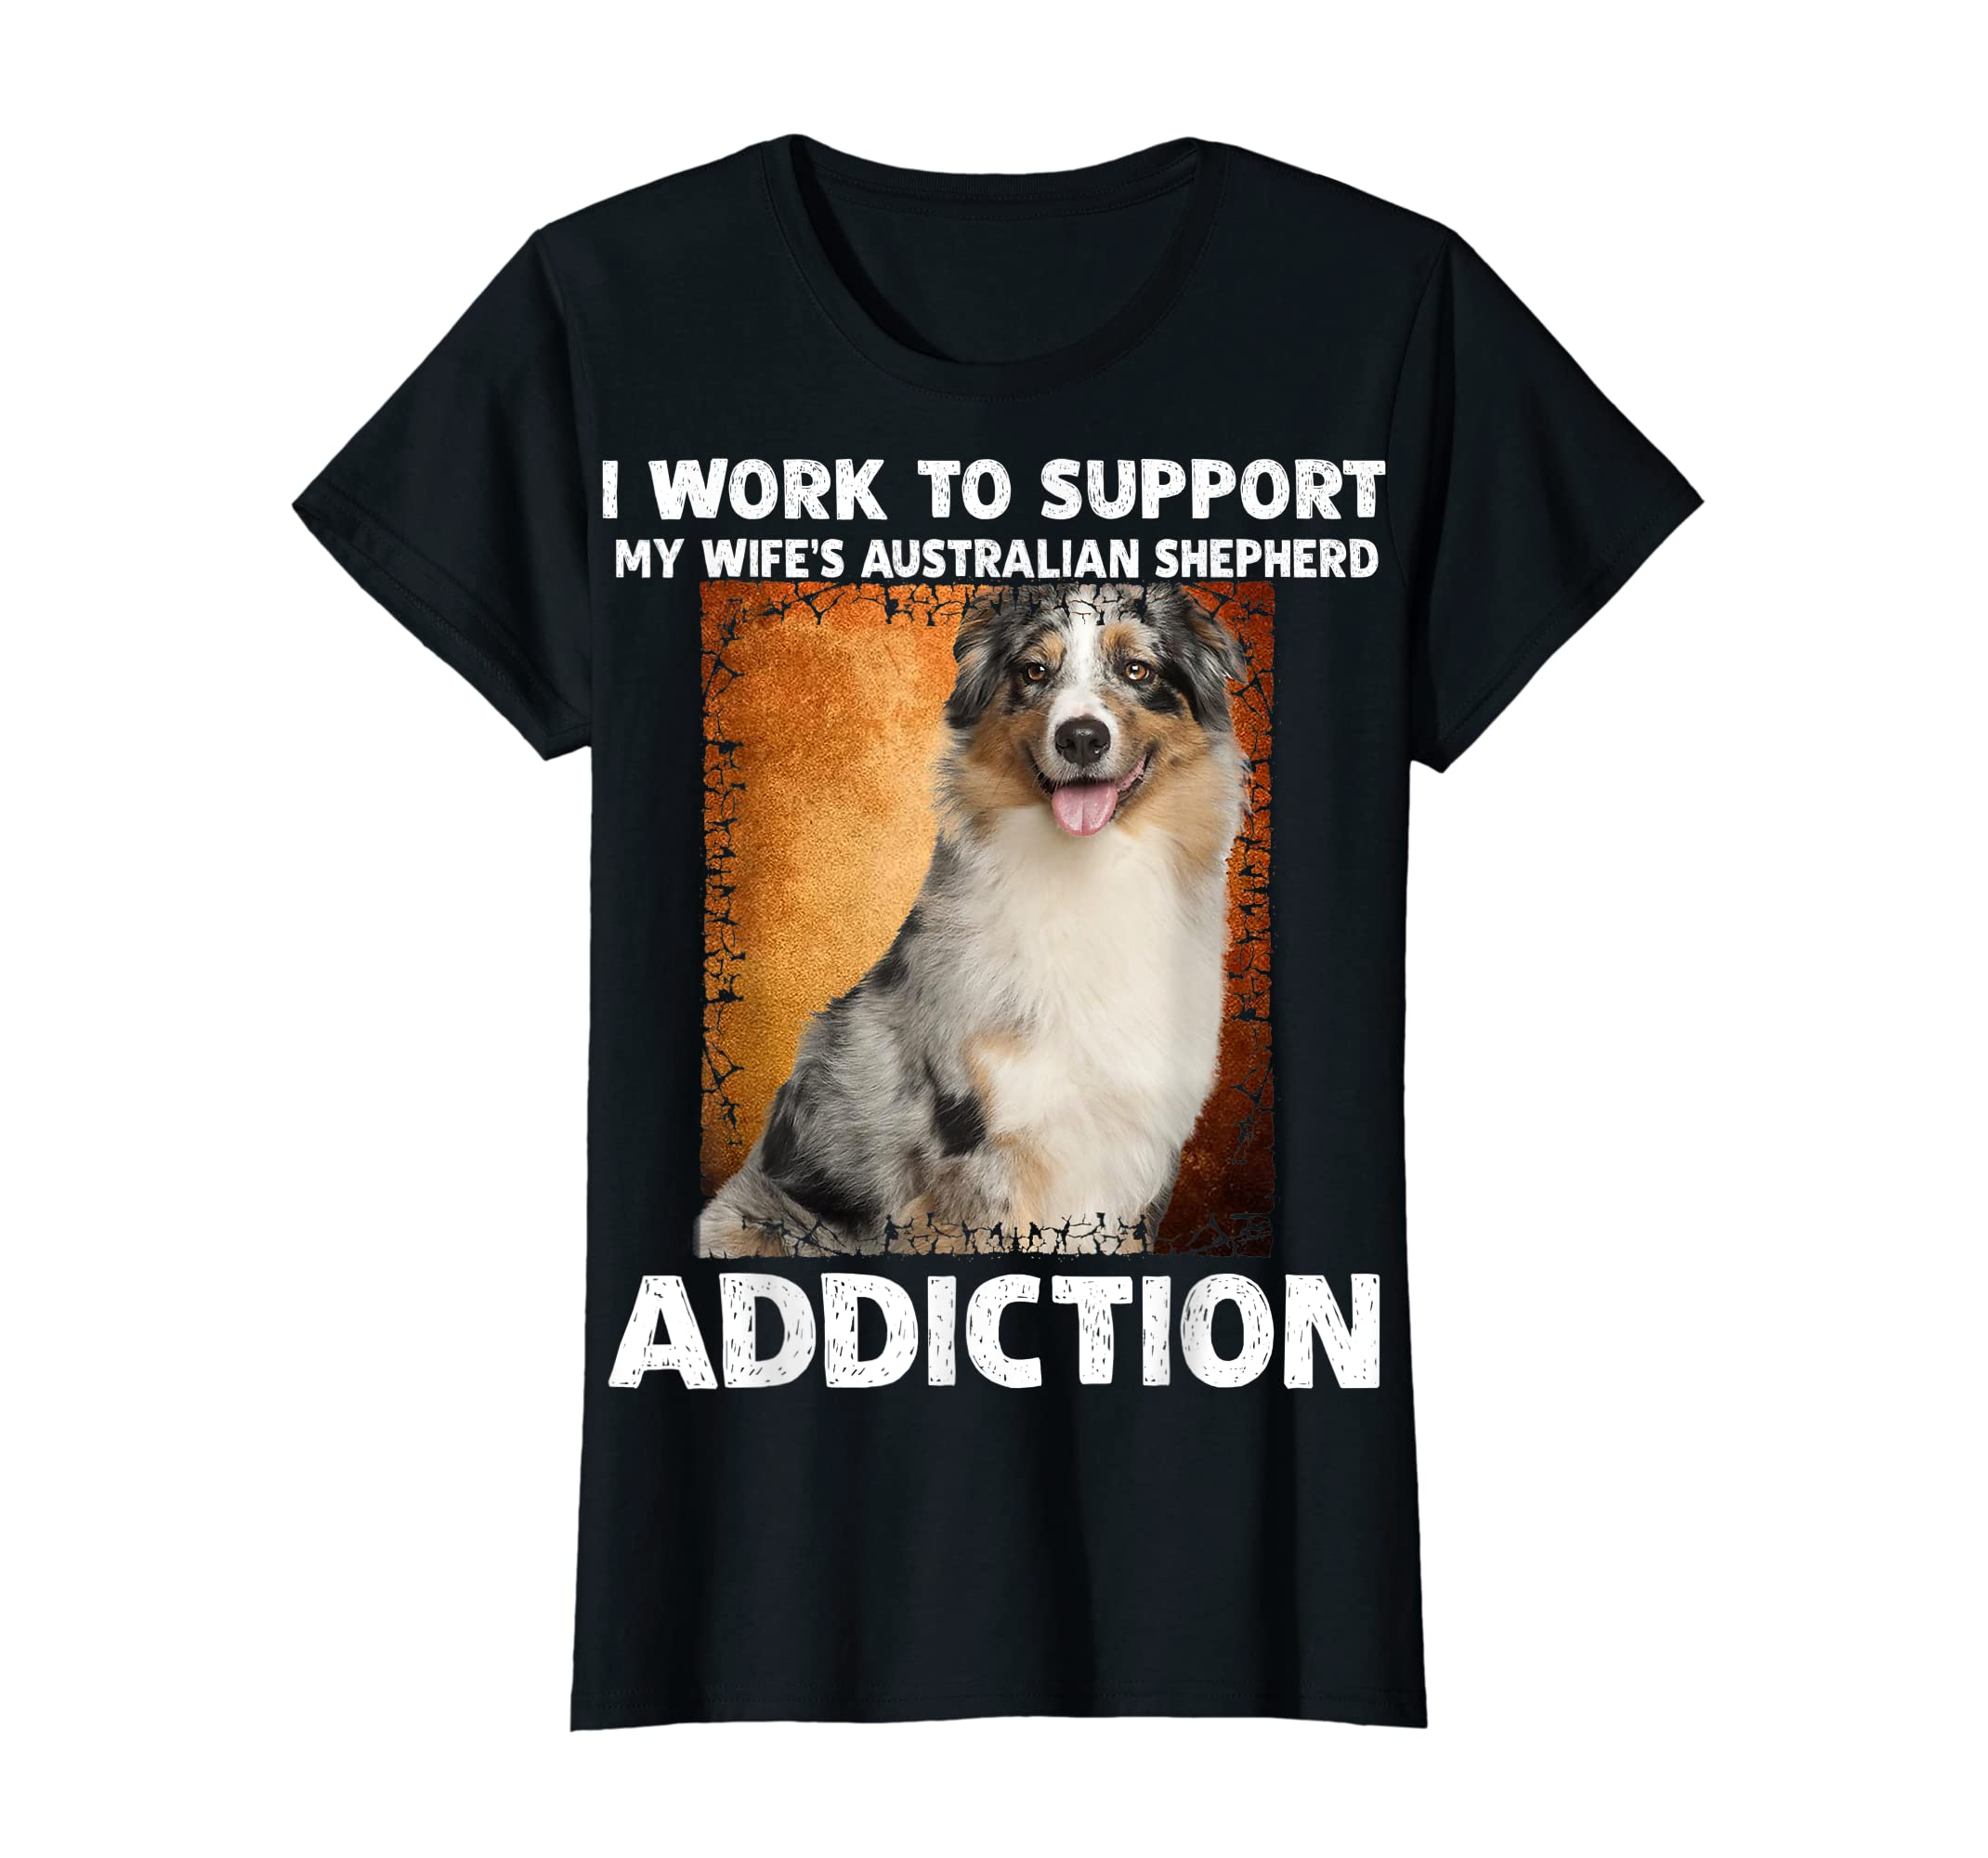 I Support My Wife Australian Shepherd Addiction T-Shirt-Women's T-Shirt-Black